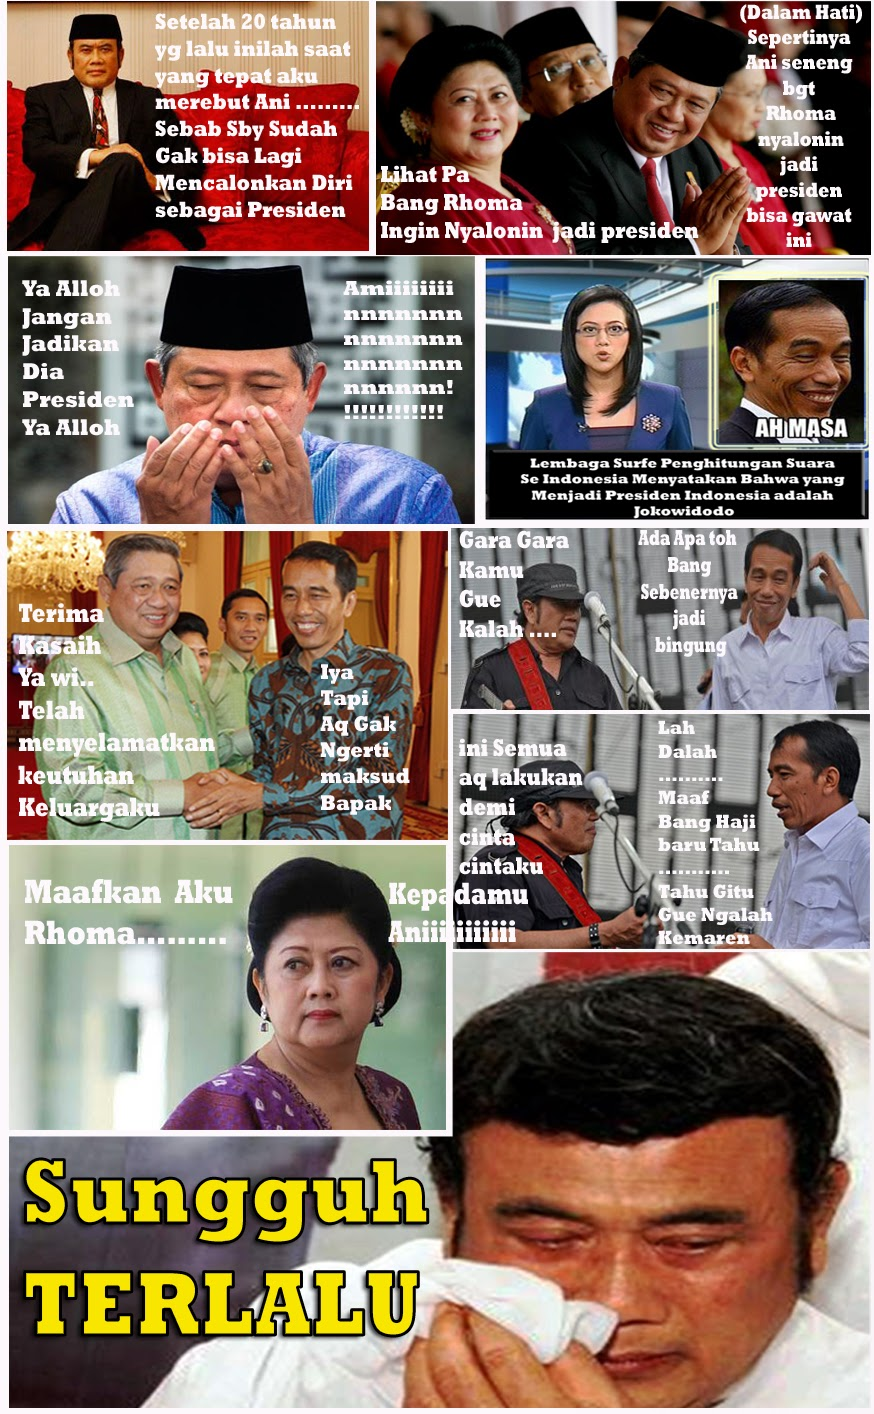 Download Meme Lucu Tentang Cinta Kumpulan Gambar DP BBM